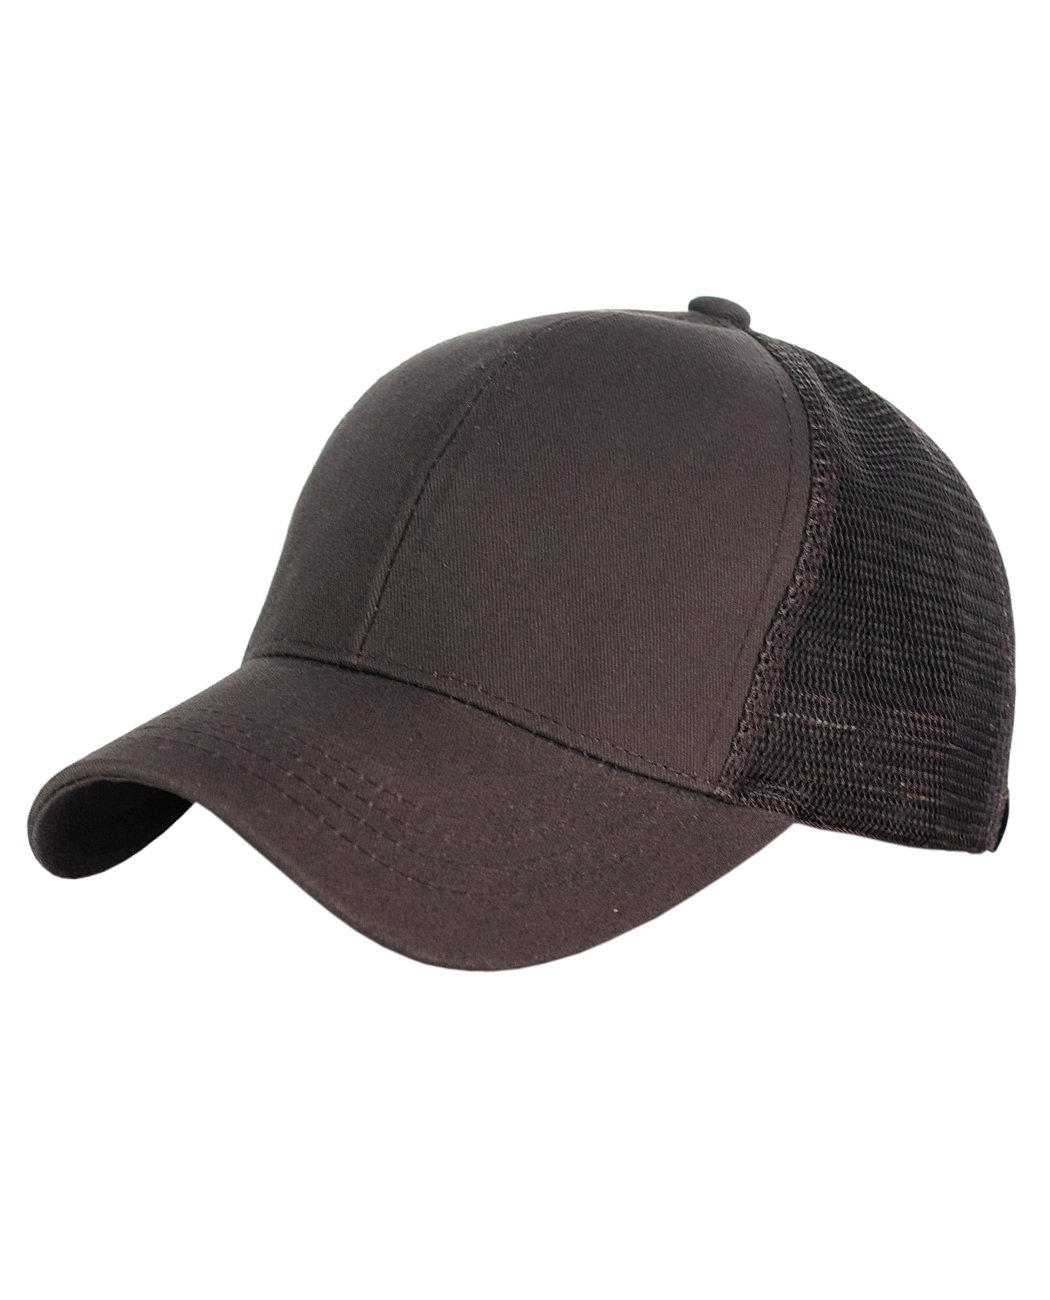 eae7b2361 C.C Ponycap Messy High Bun Ponytail Adjustable Mesh Trucker Baseball Cap Hat  Beige BT4-BG Novelty ...